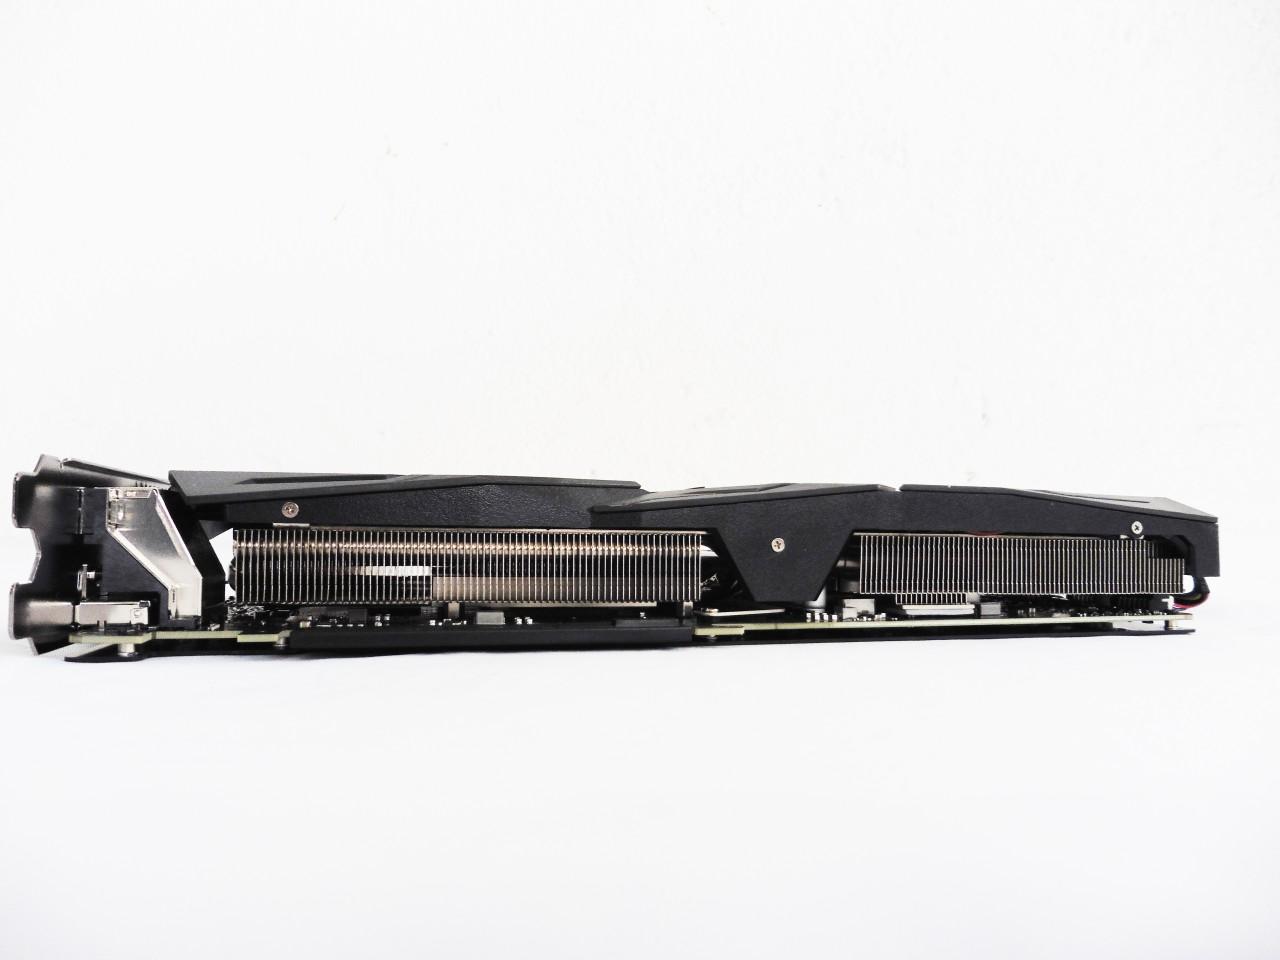 ASUS ROG Strix GeForce GTX 1070 Review 36